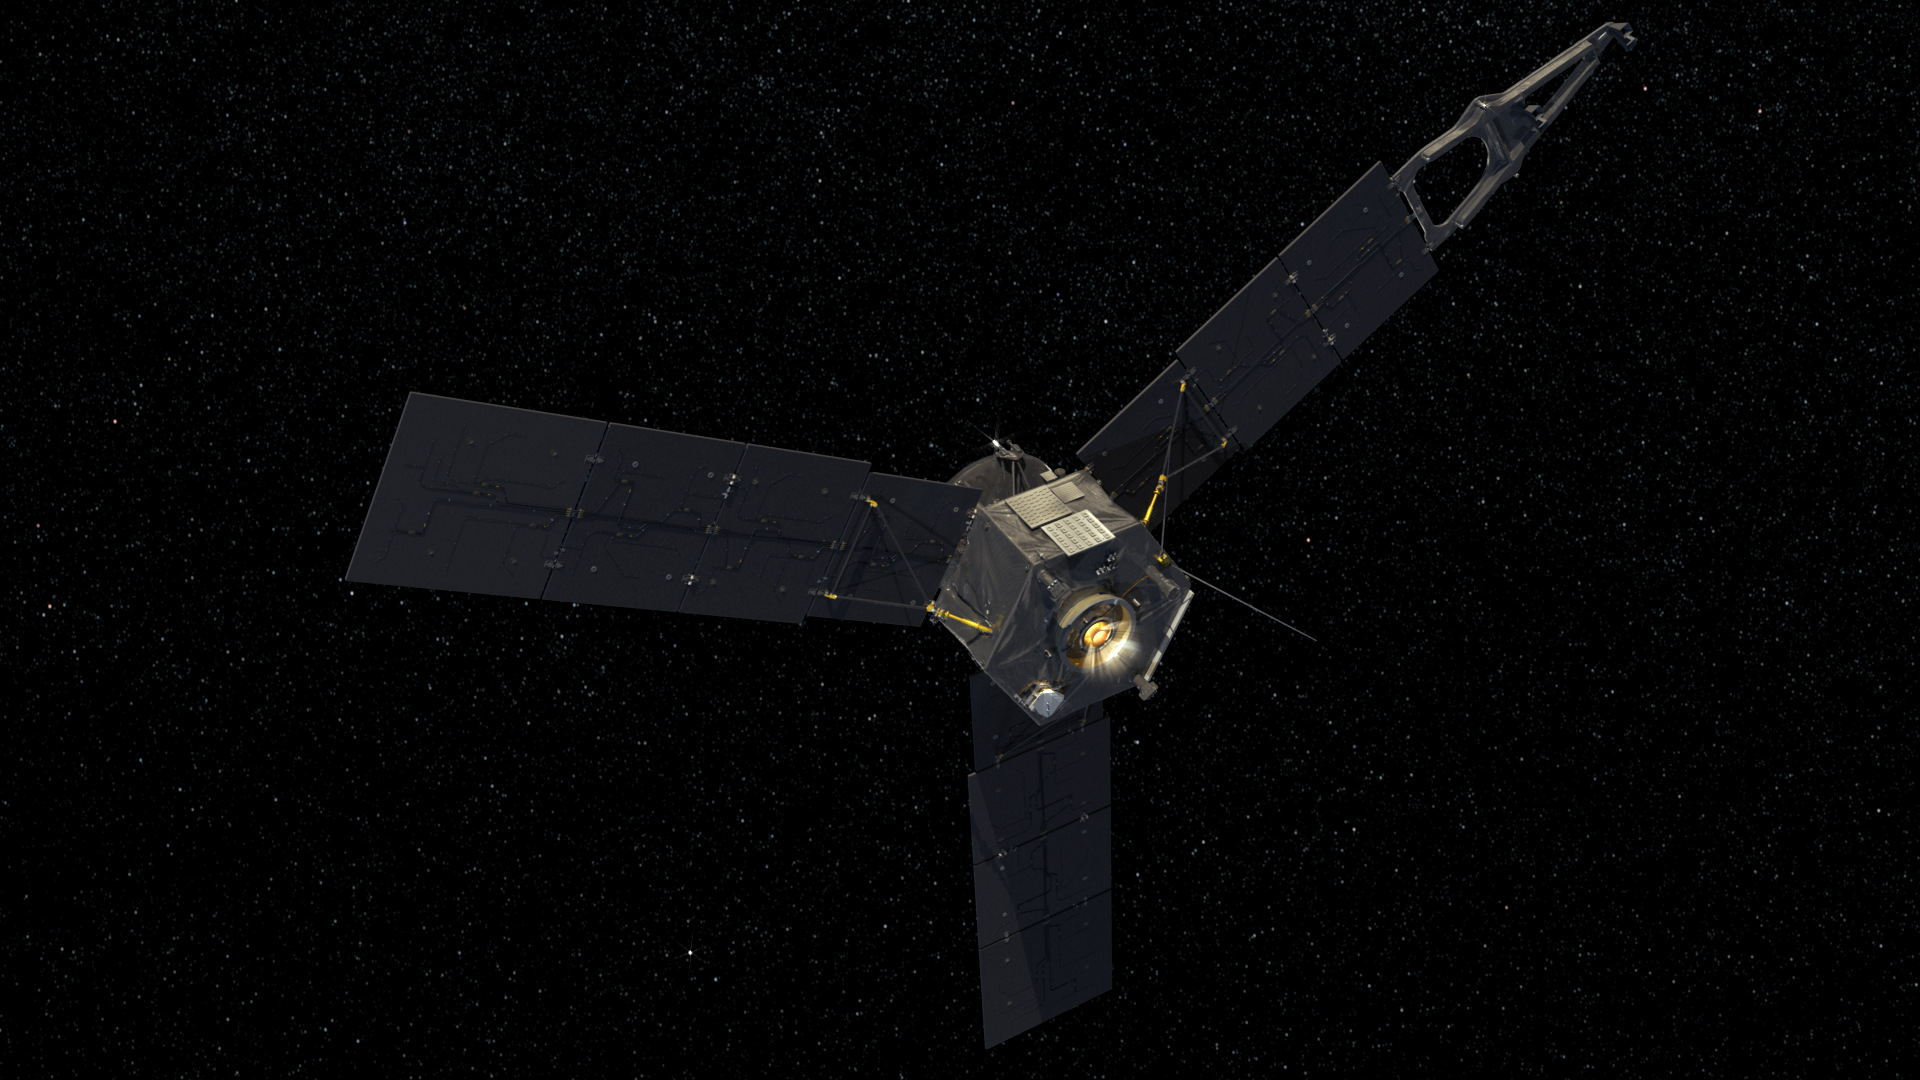 juno spacecraft - photo #1